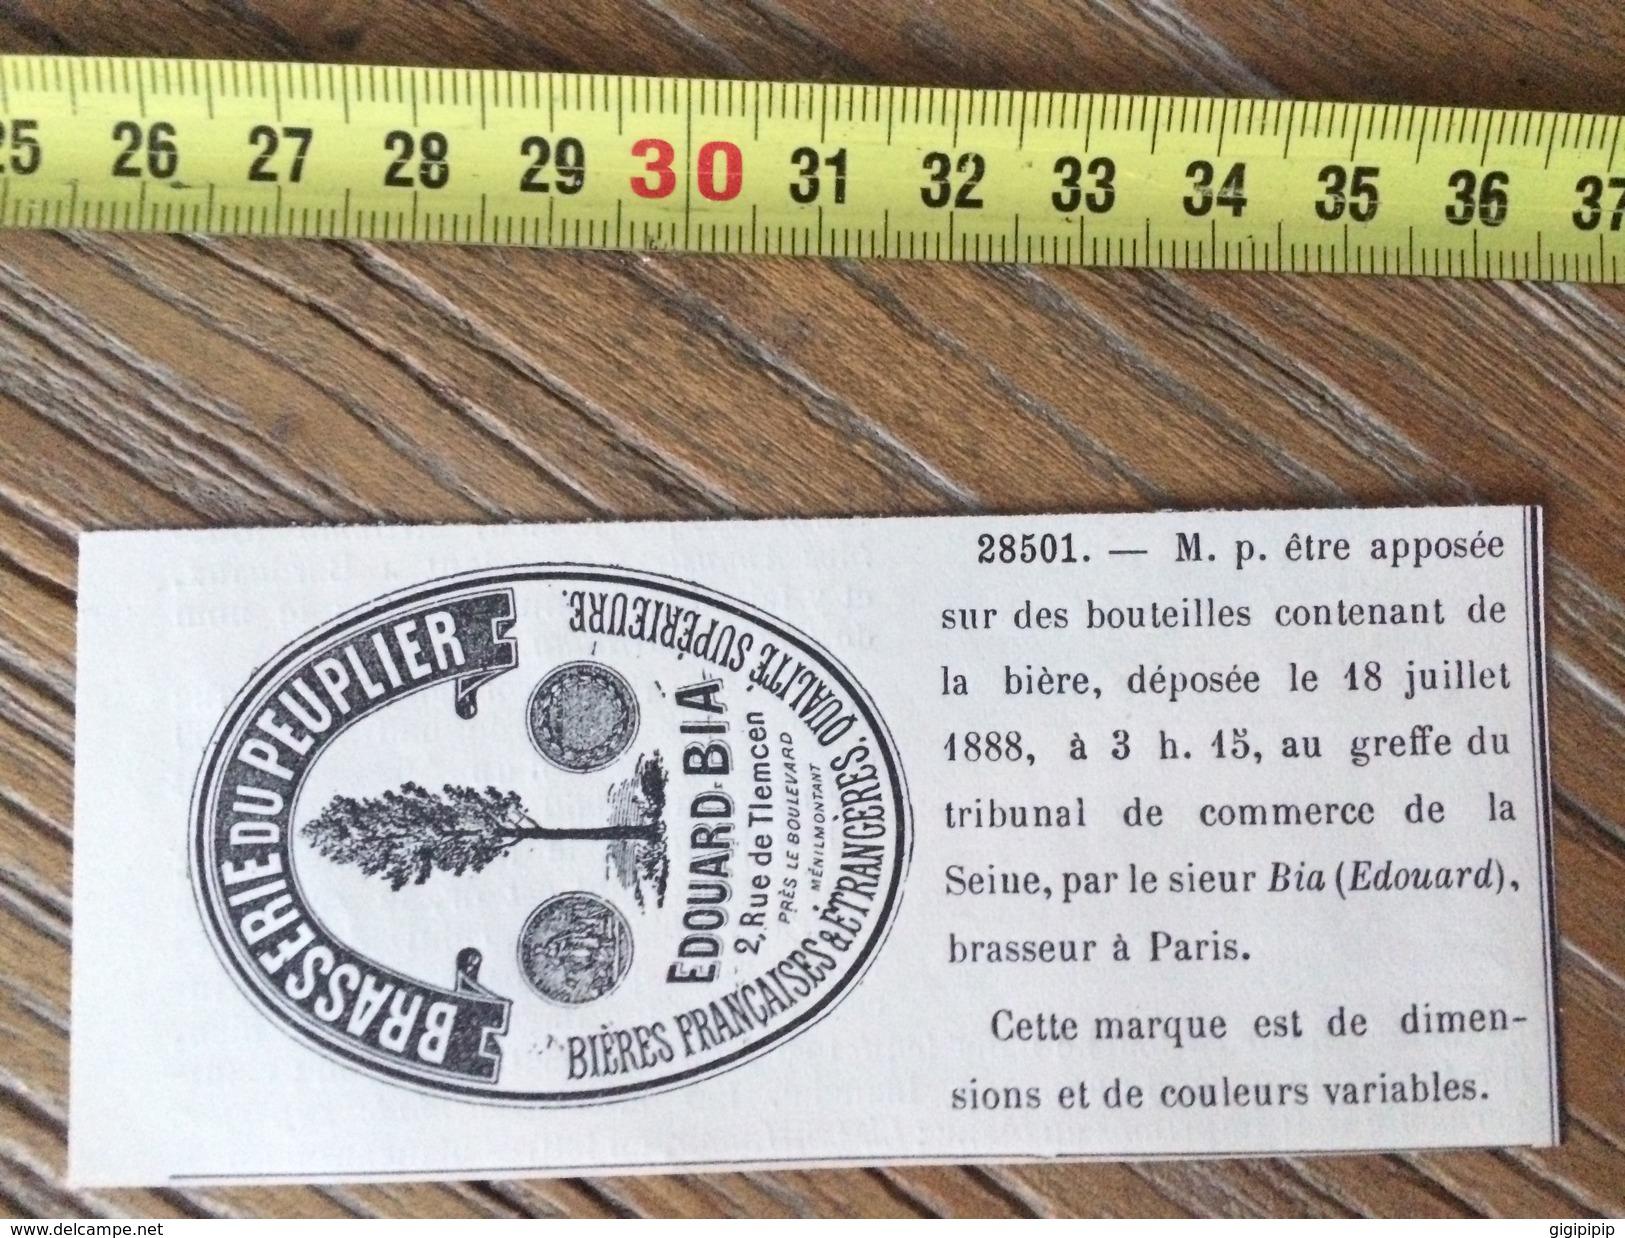 MARQUE DEPOSEE 1888 BIERE BRASSERIE DU PEULIER EDOUARD BIA BRASSEUR A PARIS - Collections